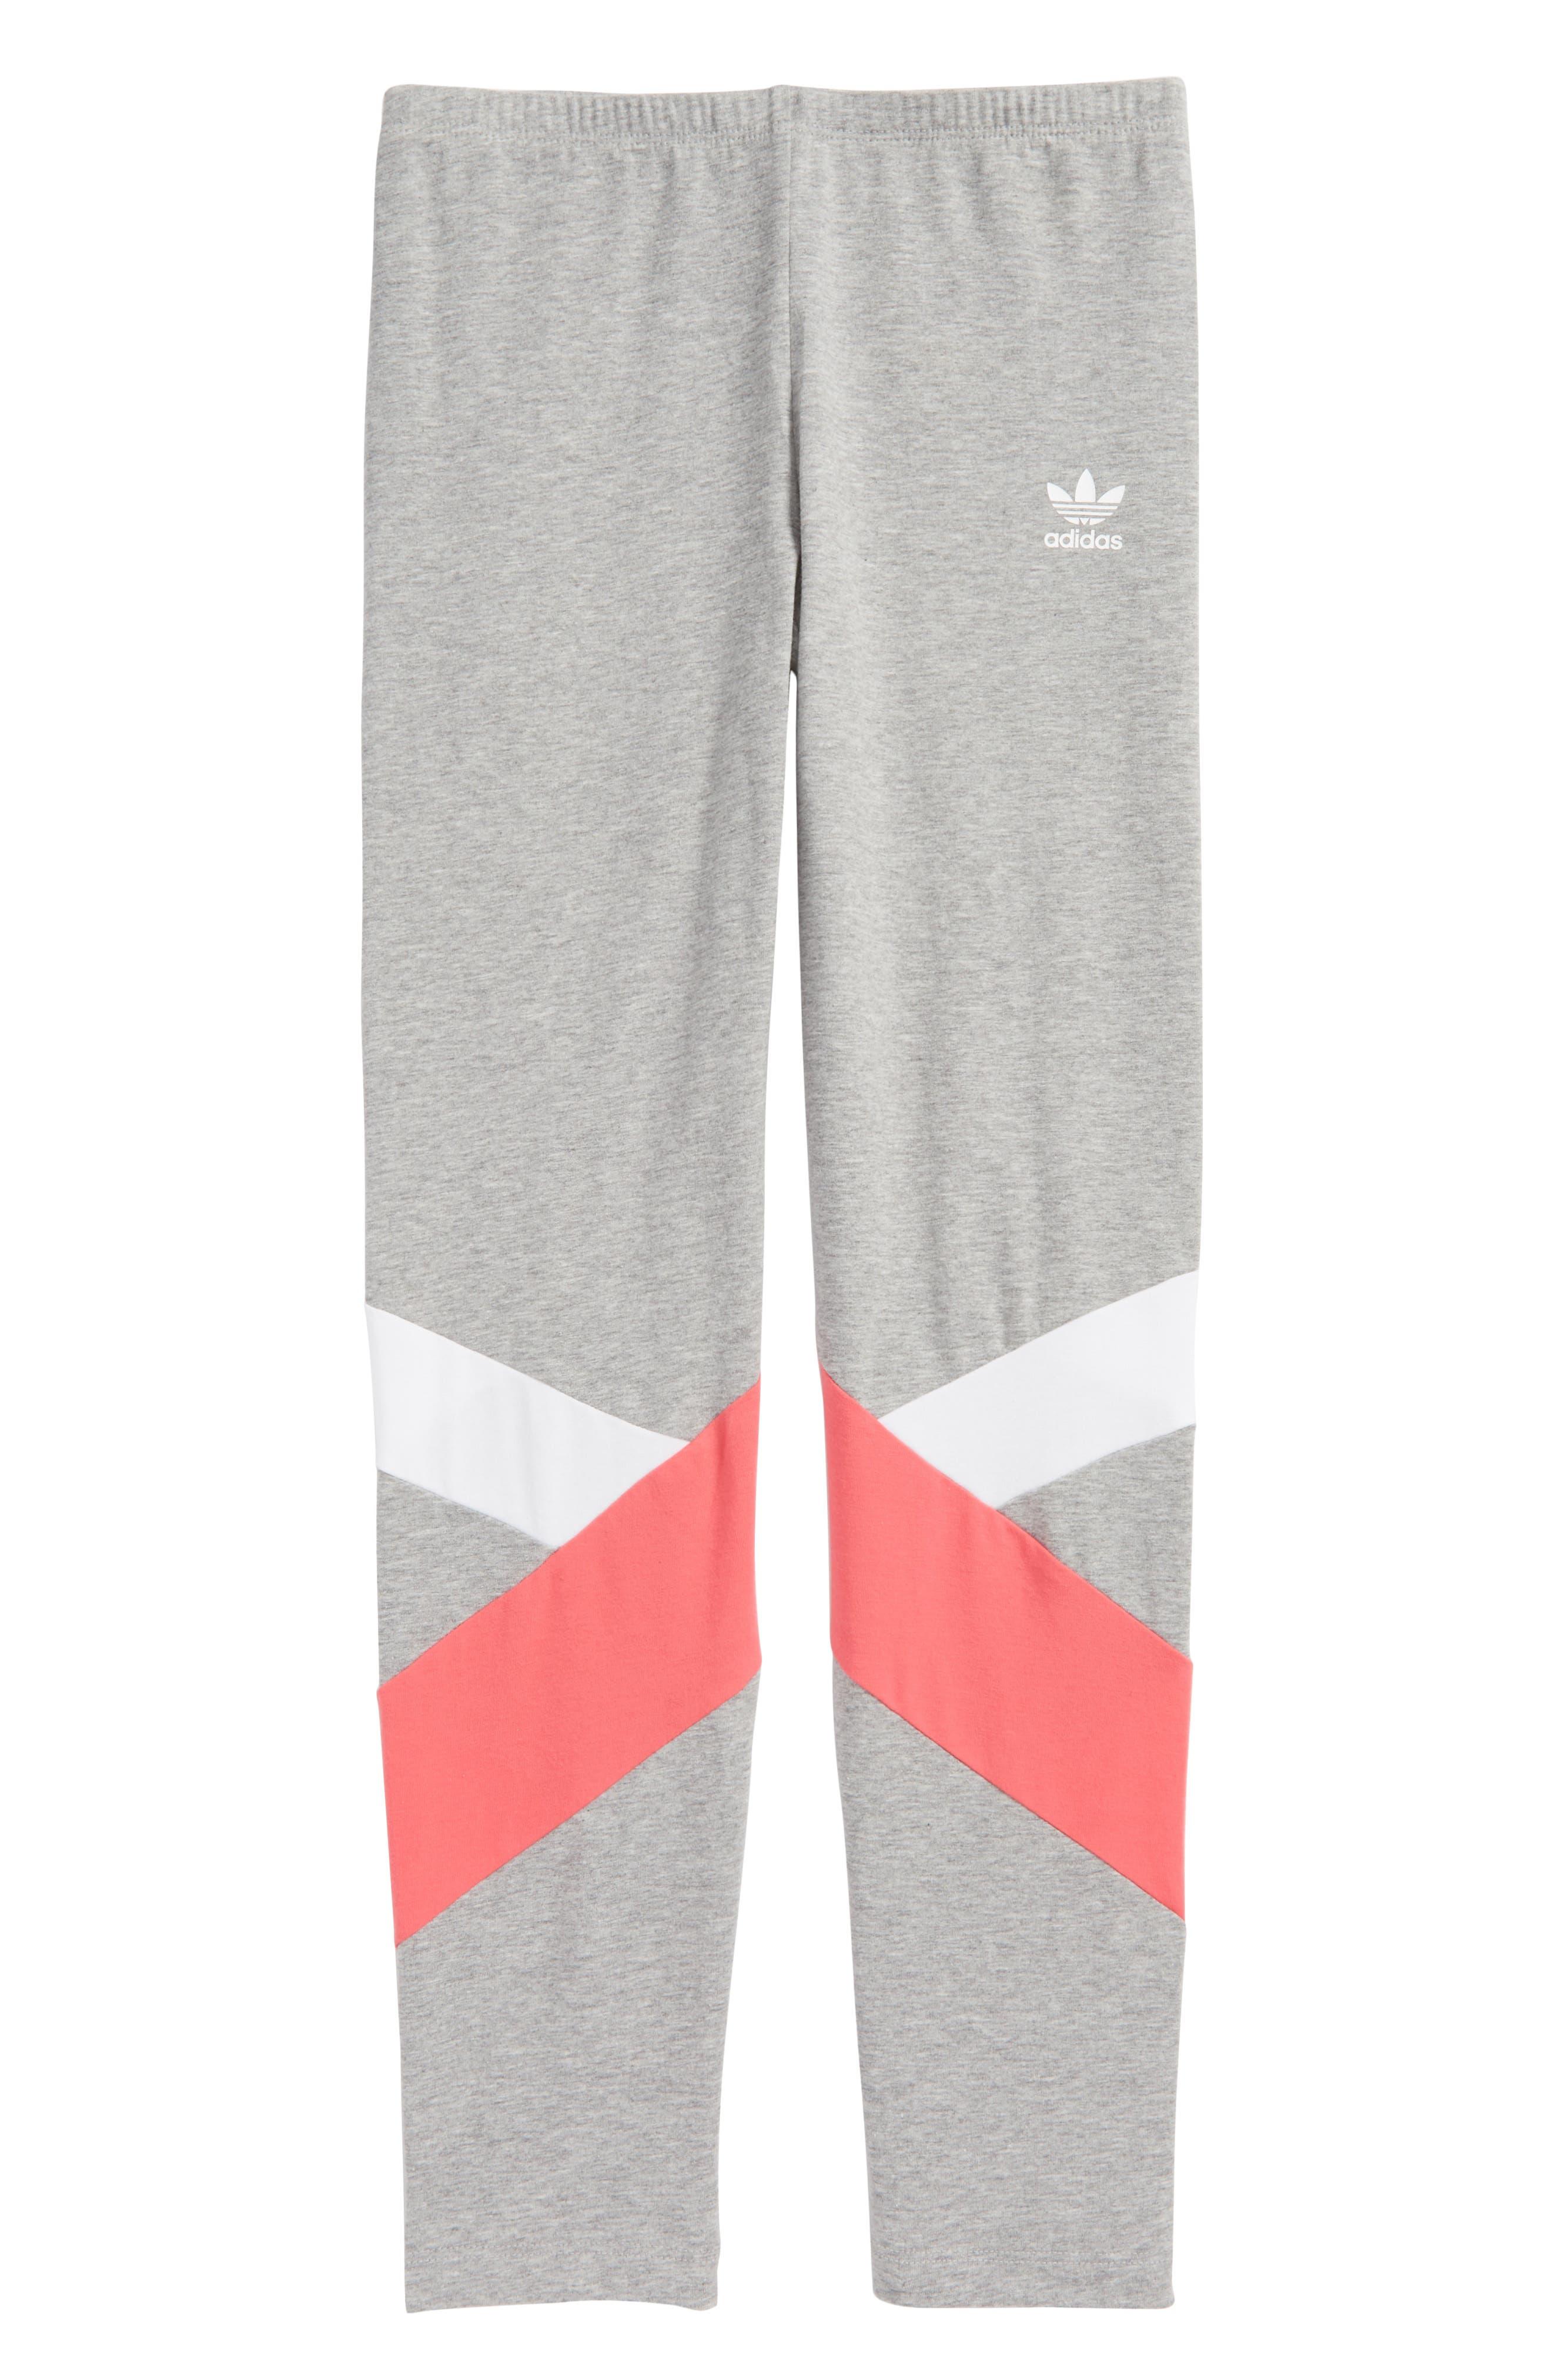 adidas J Leggings,                         Main,                         color, Grey/ White/ Pink